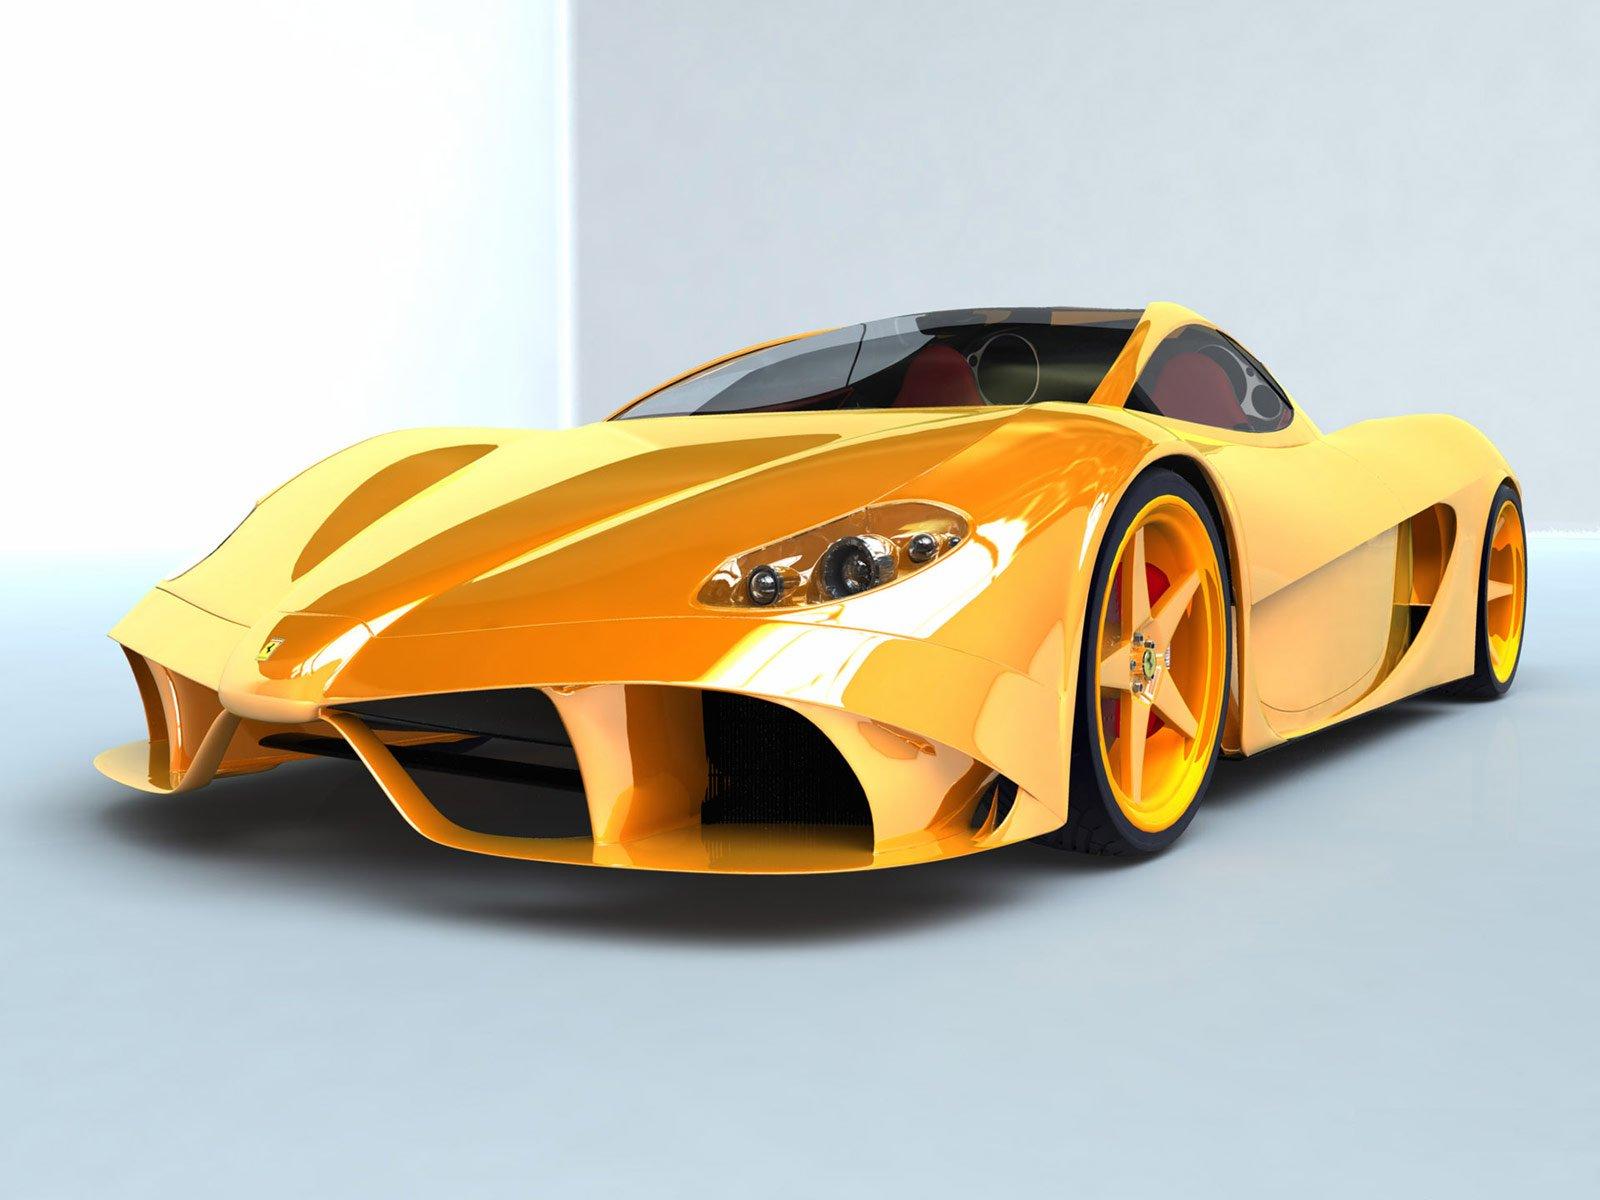 sports cars sports cars xpx sport cars wallpaper sport cars wallpaper 1600x1200